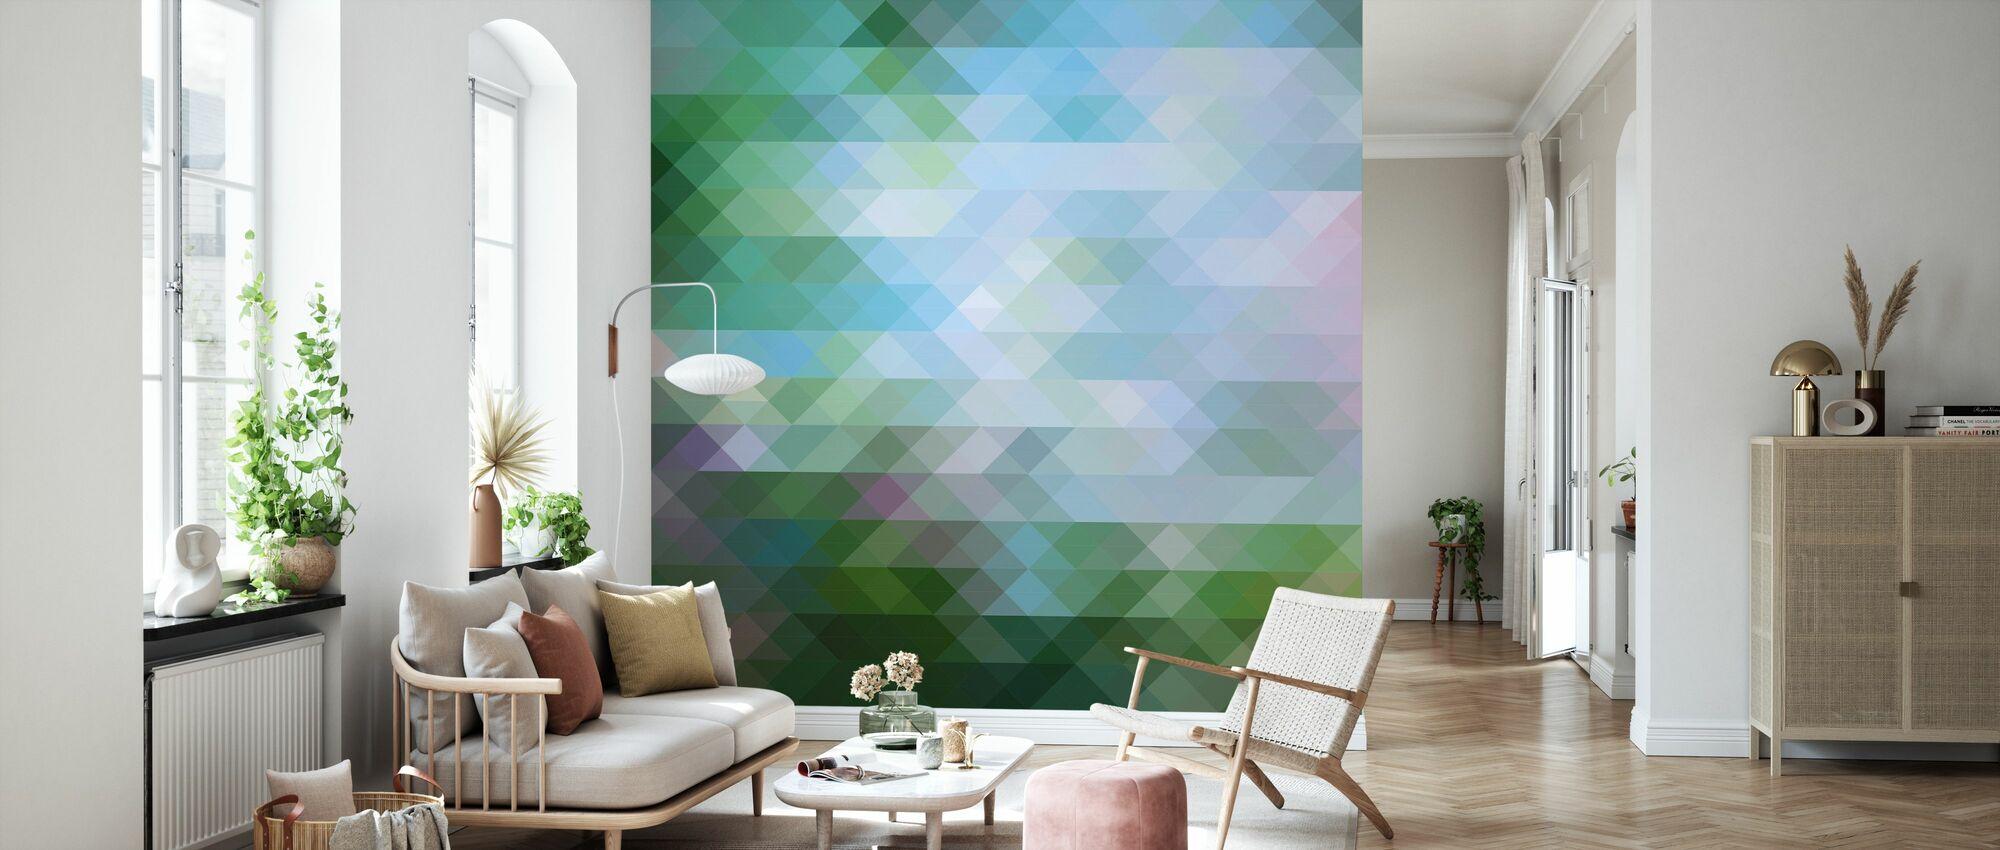 Abstract Triangular Pattern 2 - Wallpaper - Living Room